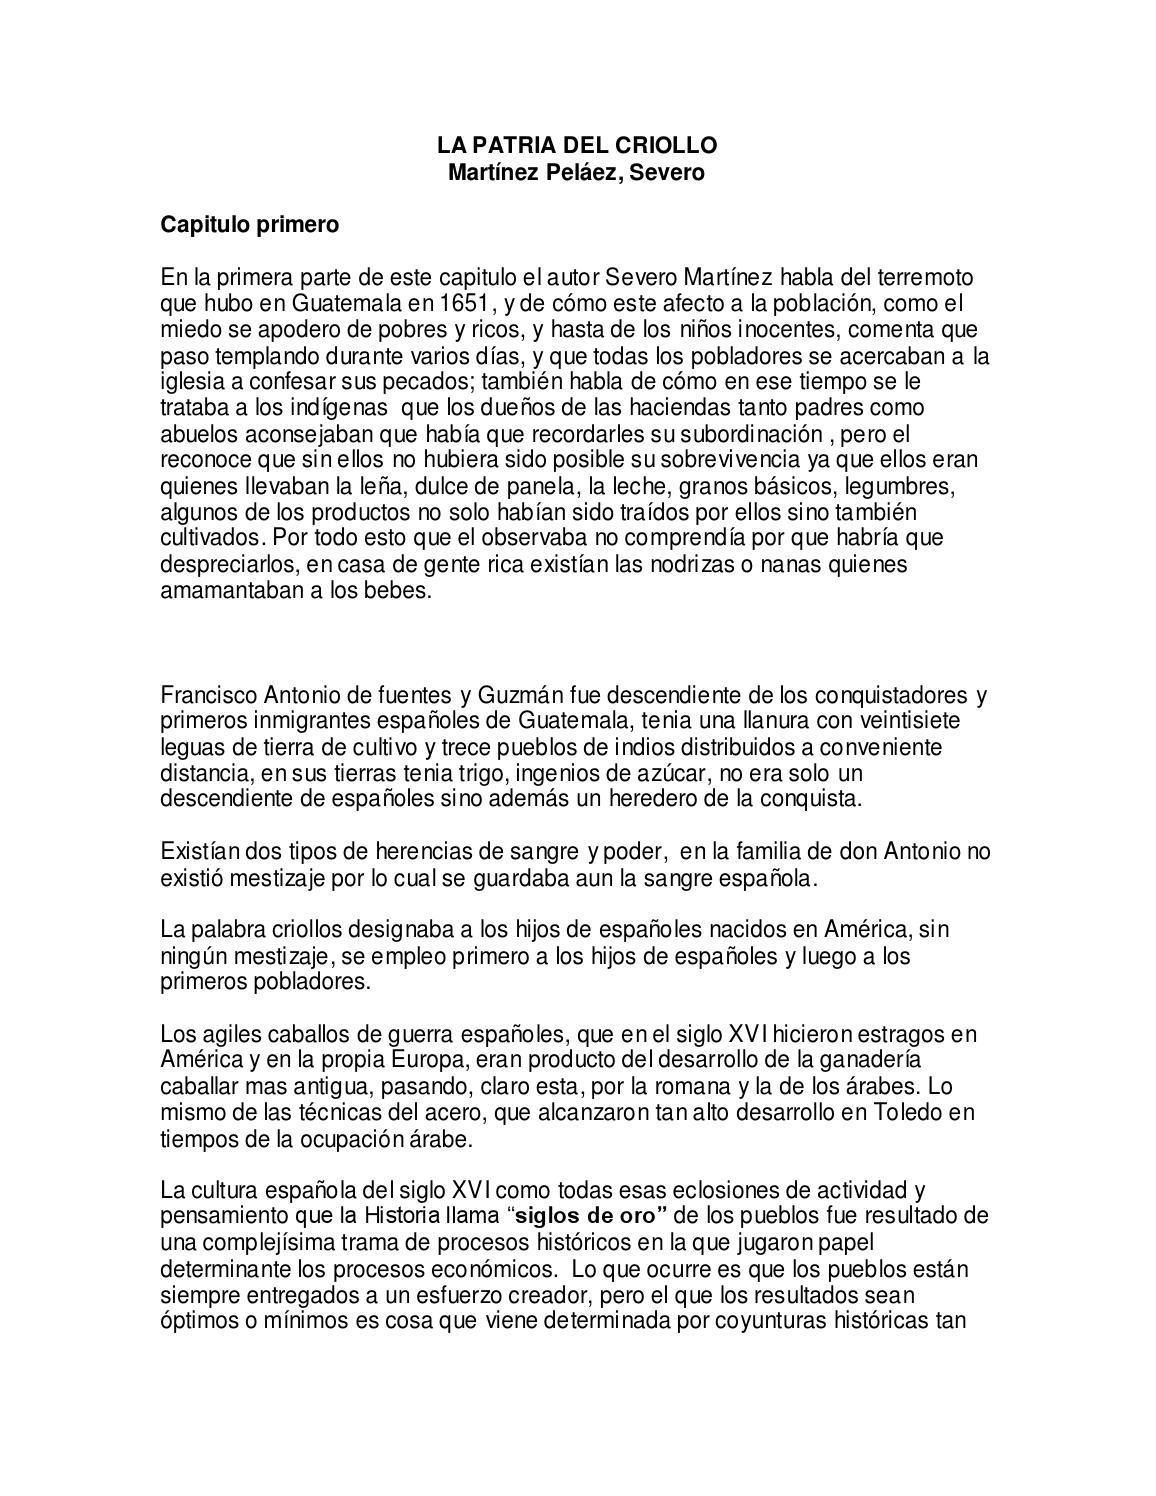 Patria del criollo signed by Jennifer Alvarado - issuu